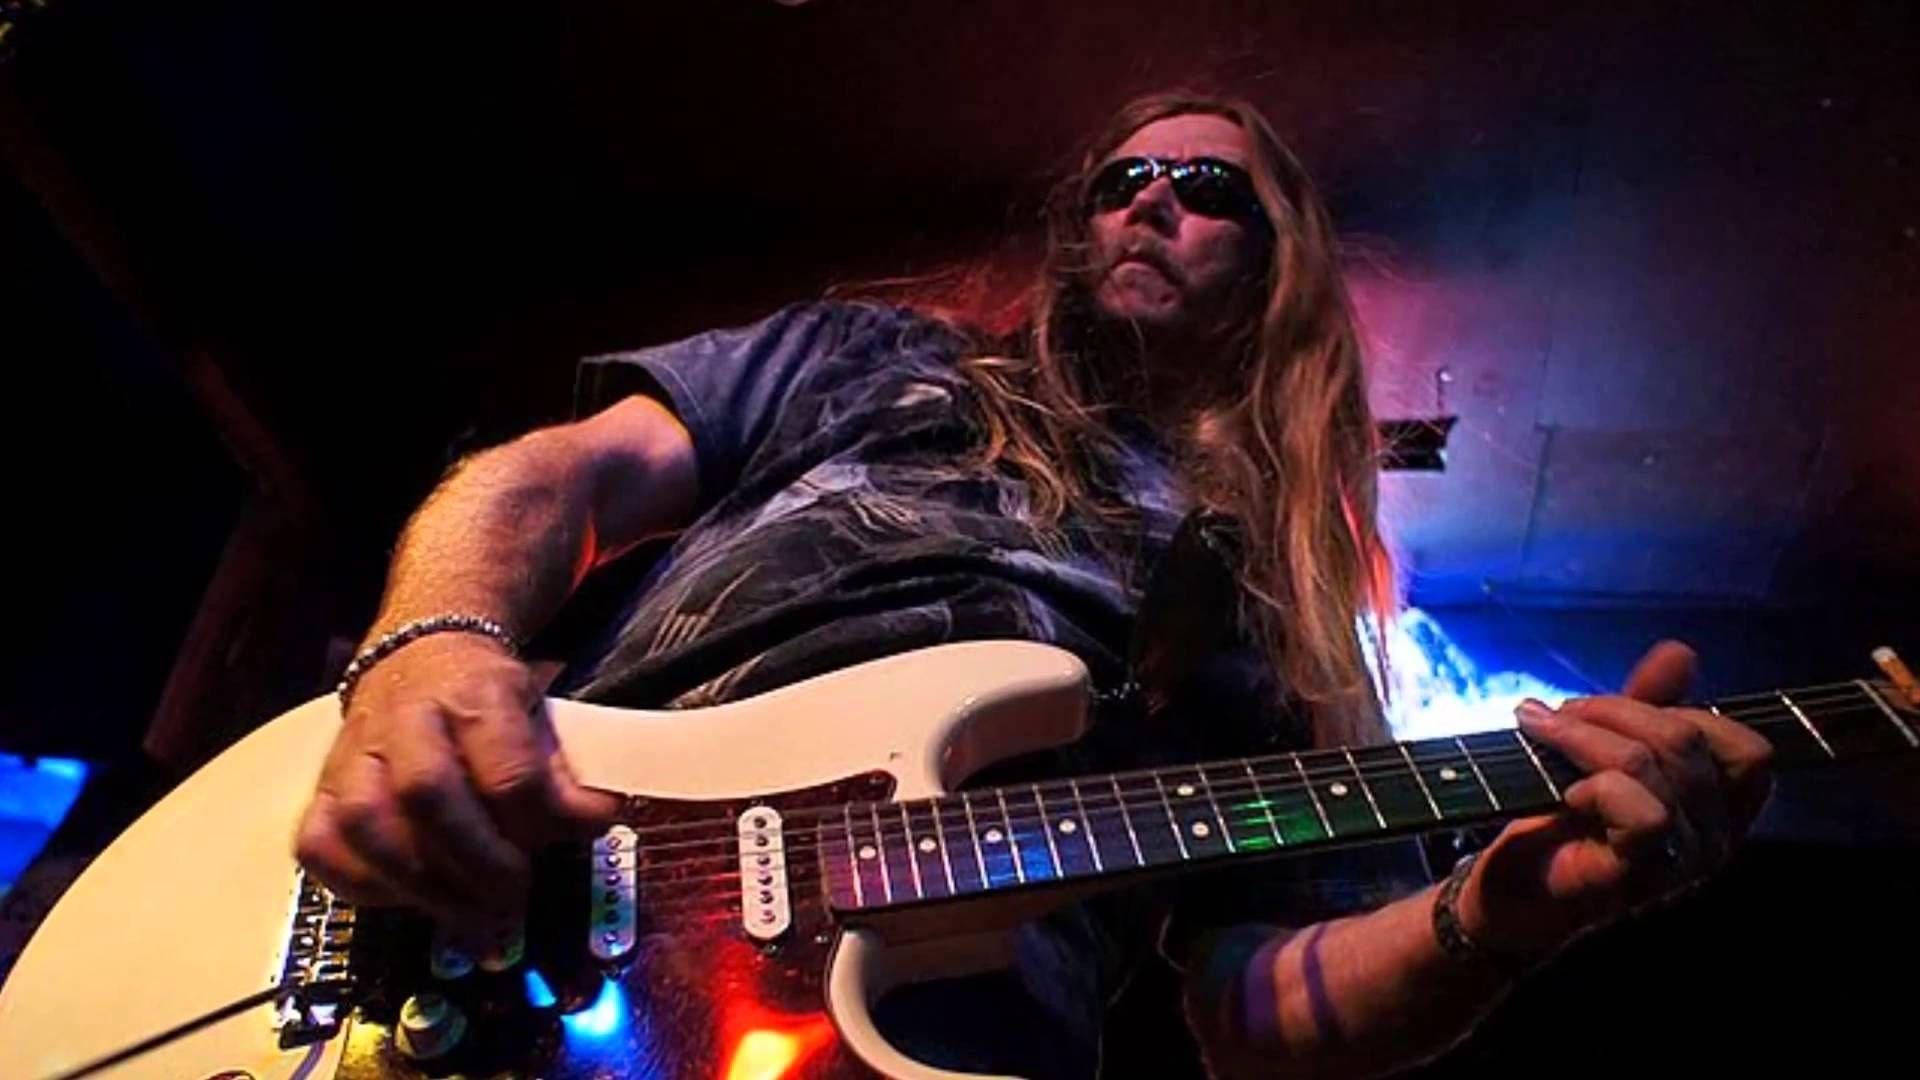 DeVille Guitar, Electric guitar, Music